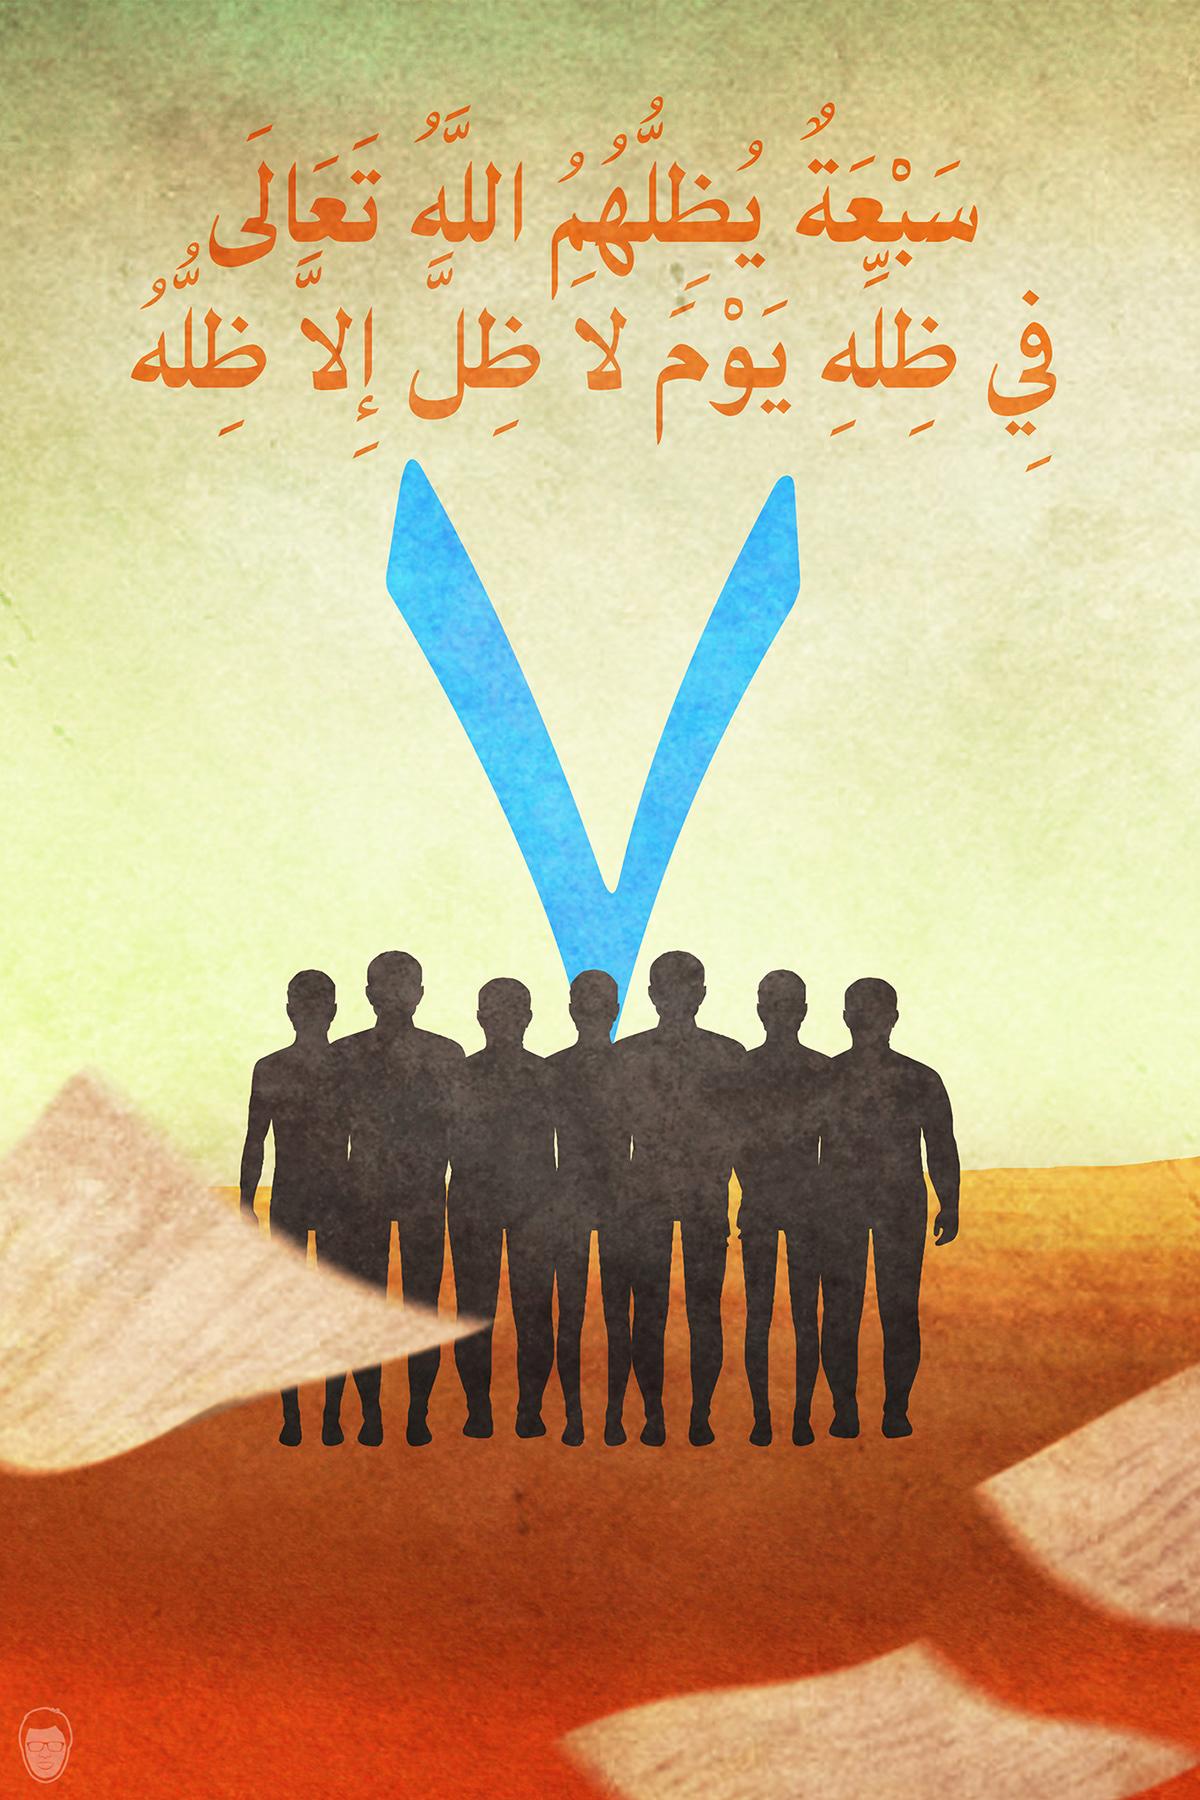 سبعة يظلهم الله في ظله يوم لا ظل إلا ظله On Behance